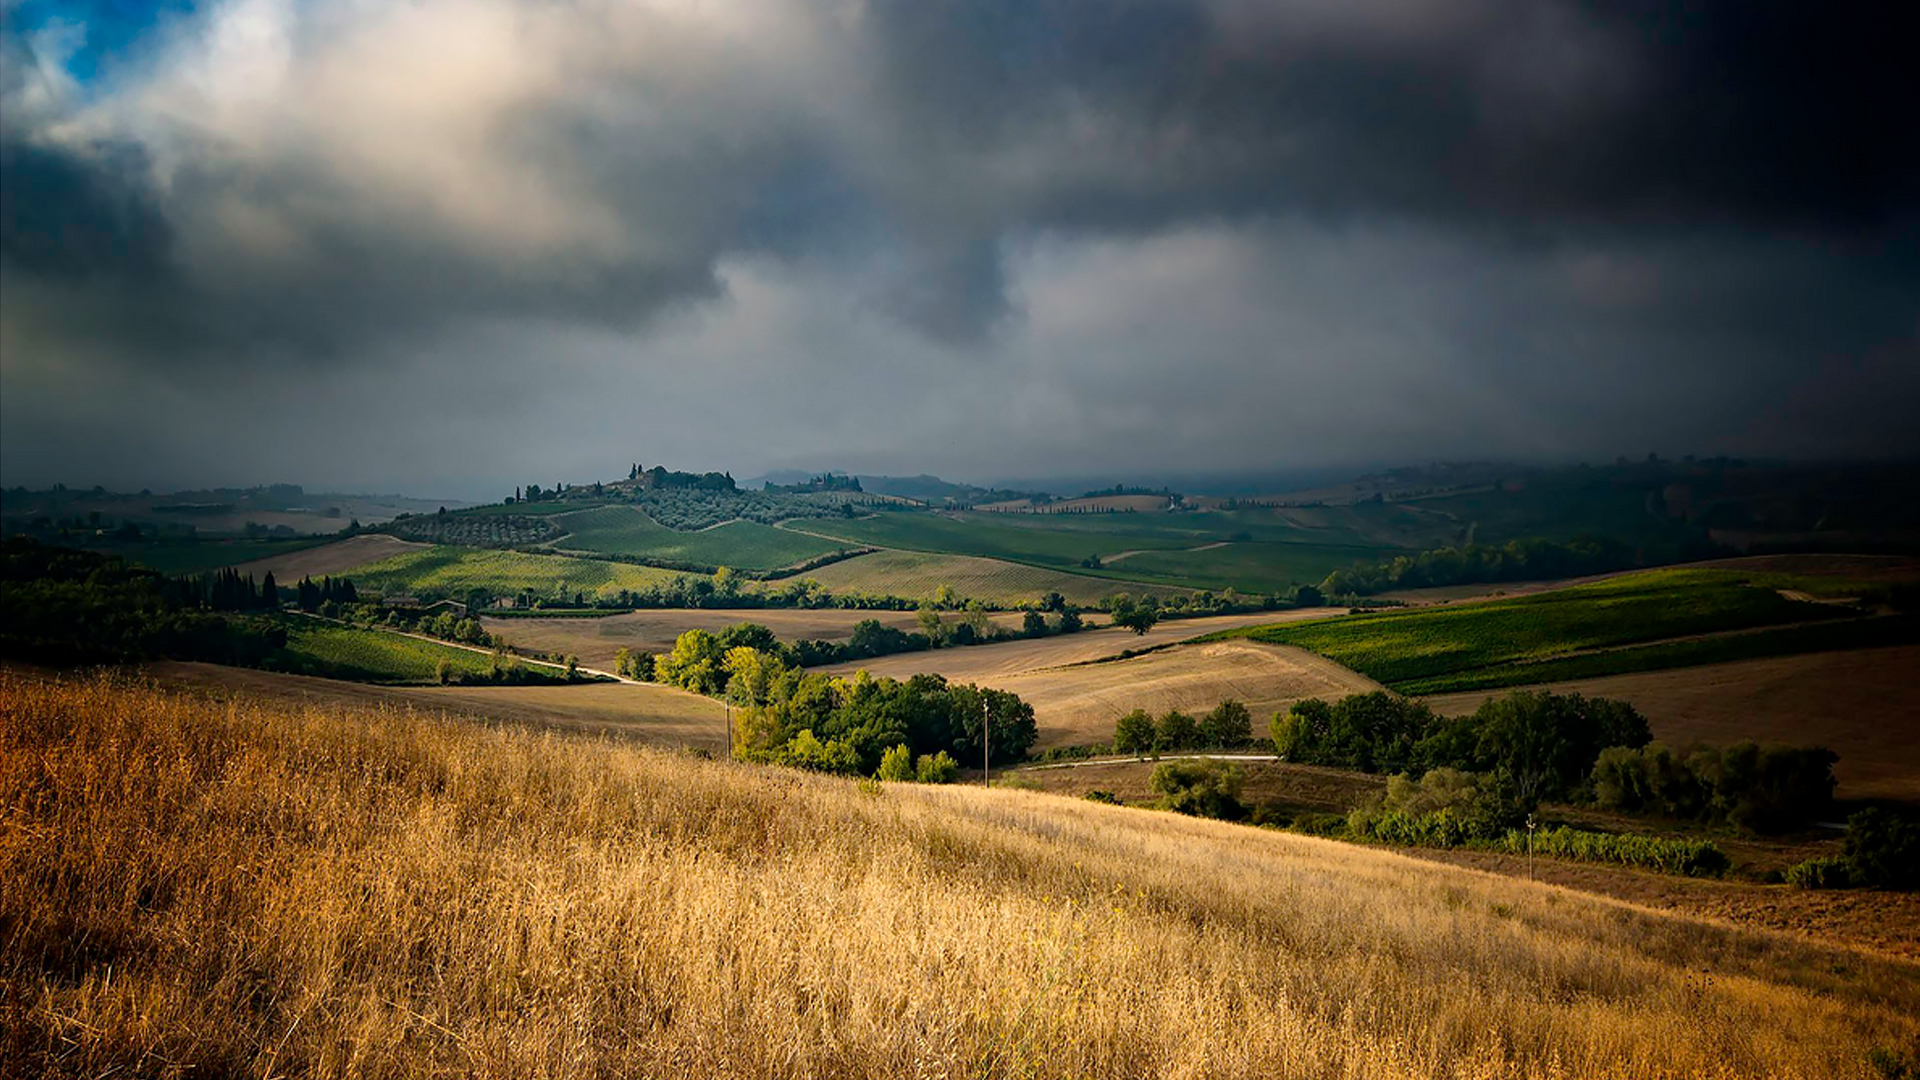 Tuscany, Itlay landscape